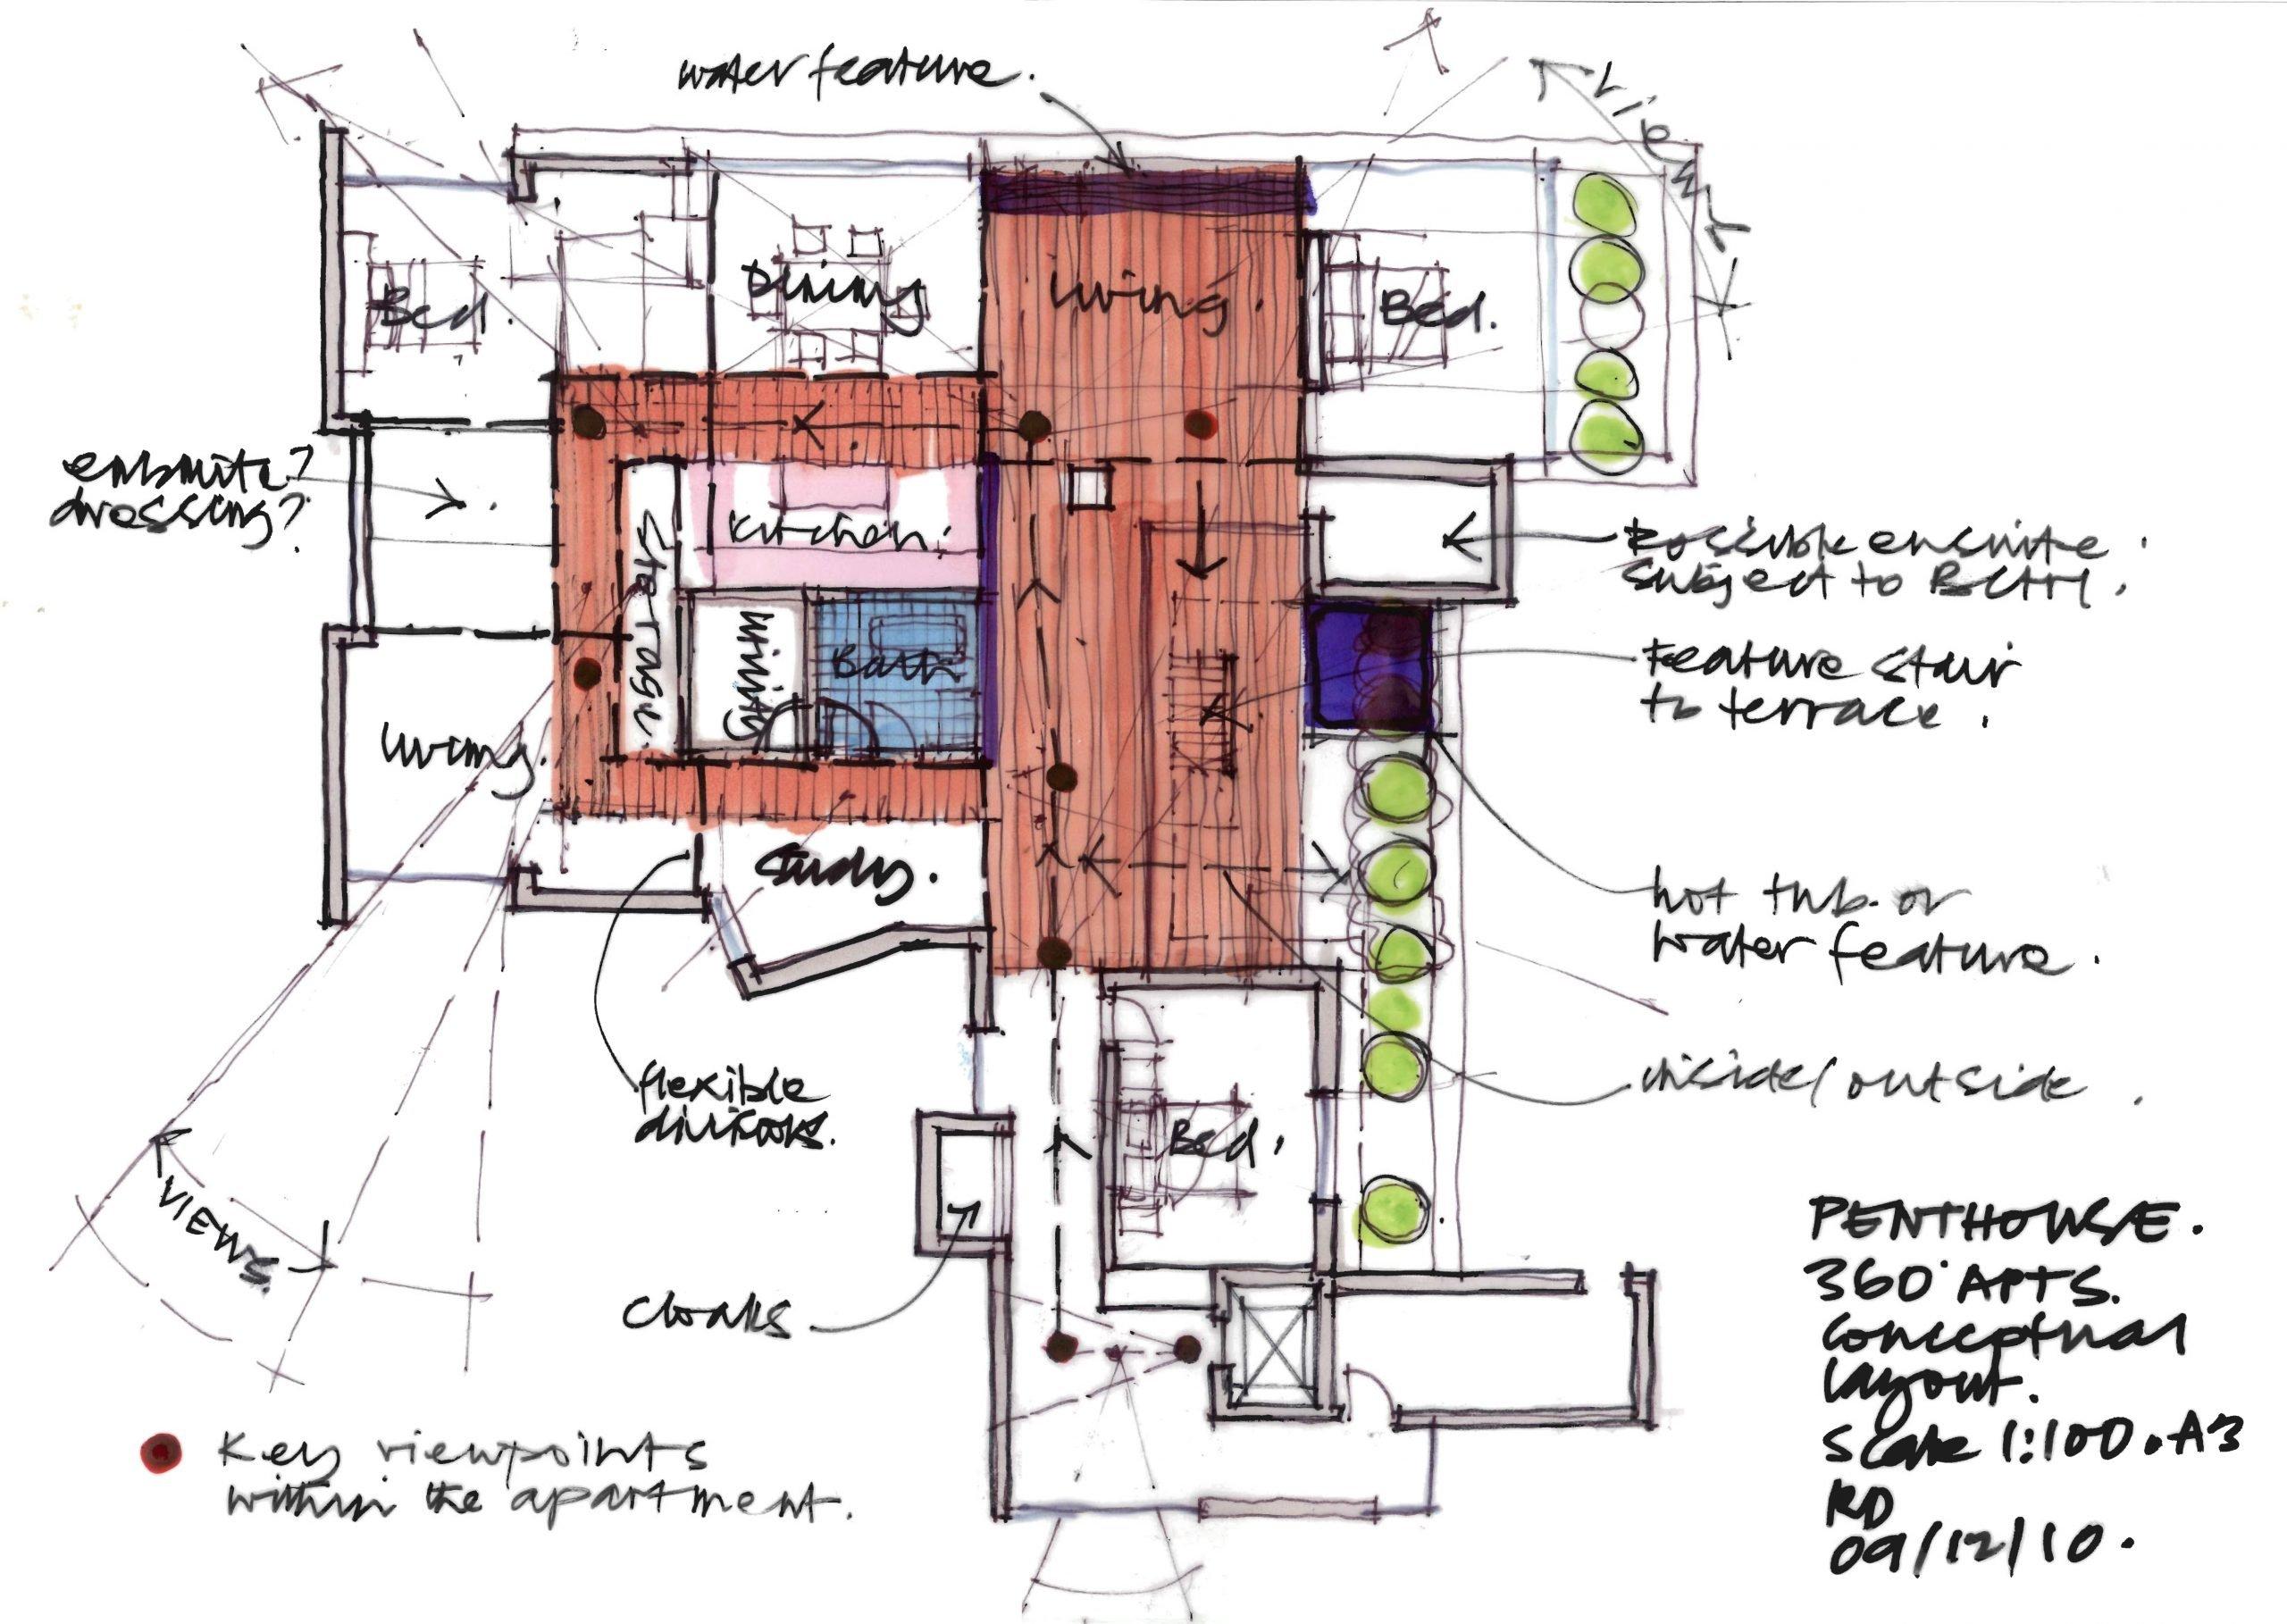 Original sketch for the penthouse